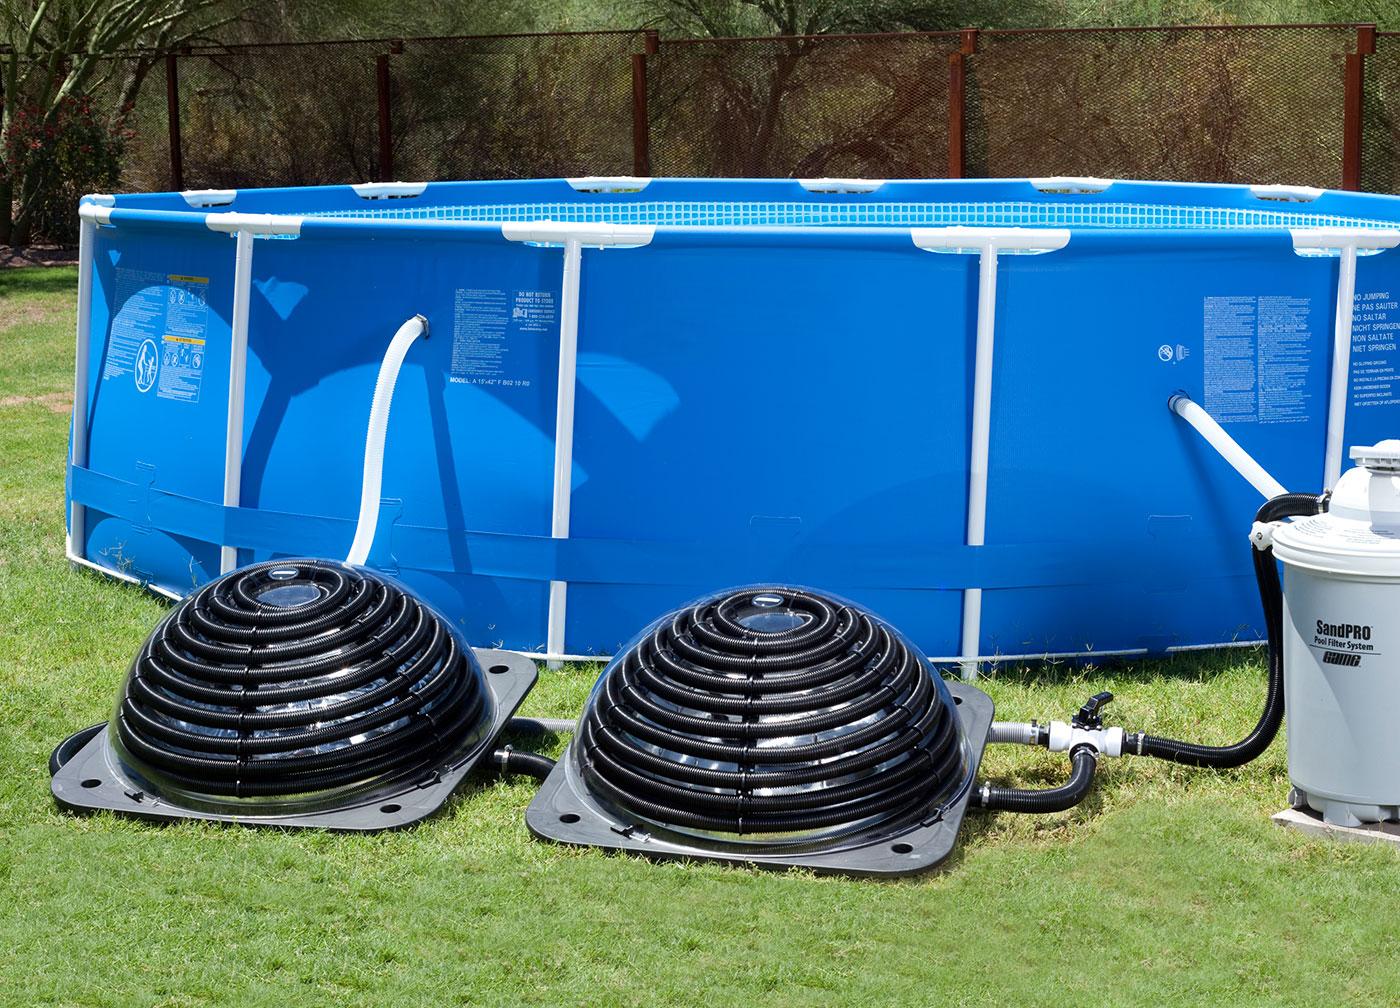 solarpro xd2 solar pool heater. Black Bedroom Furniture Sets. Home Design Ideas